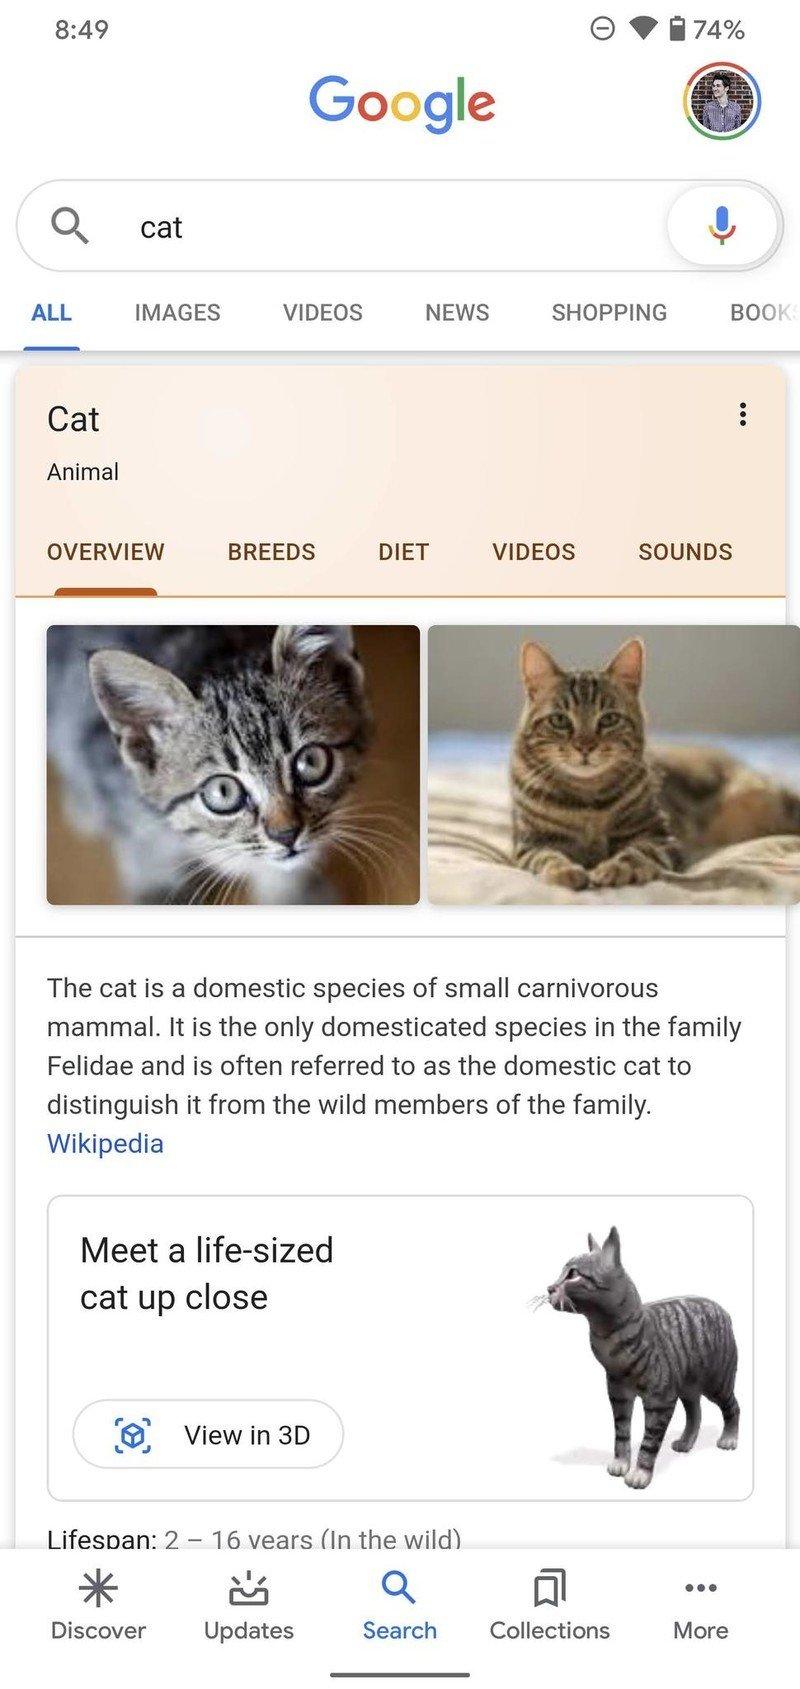 google-3d-animal-how-to-2.jpg